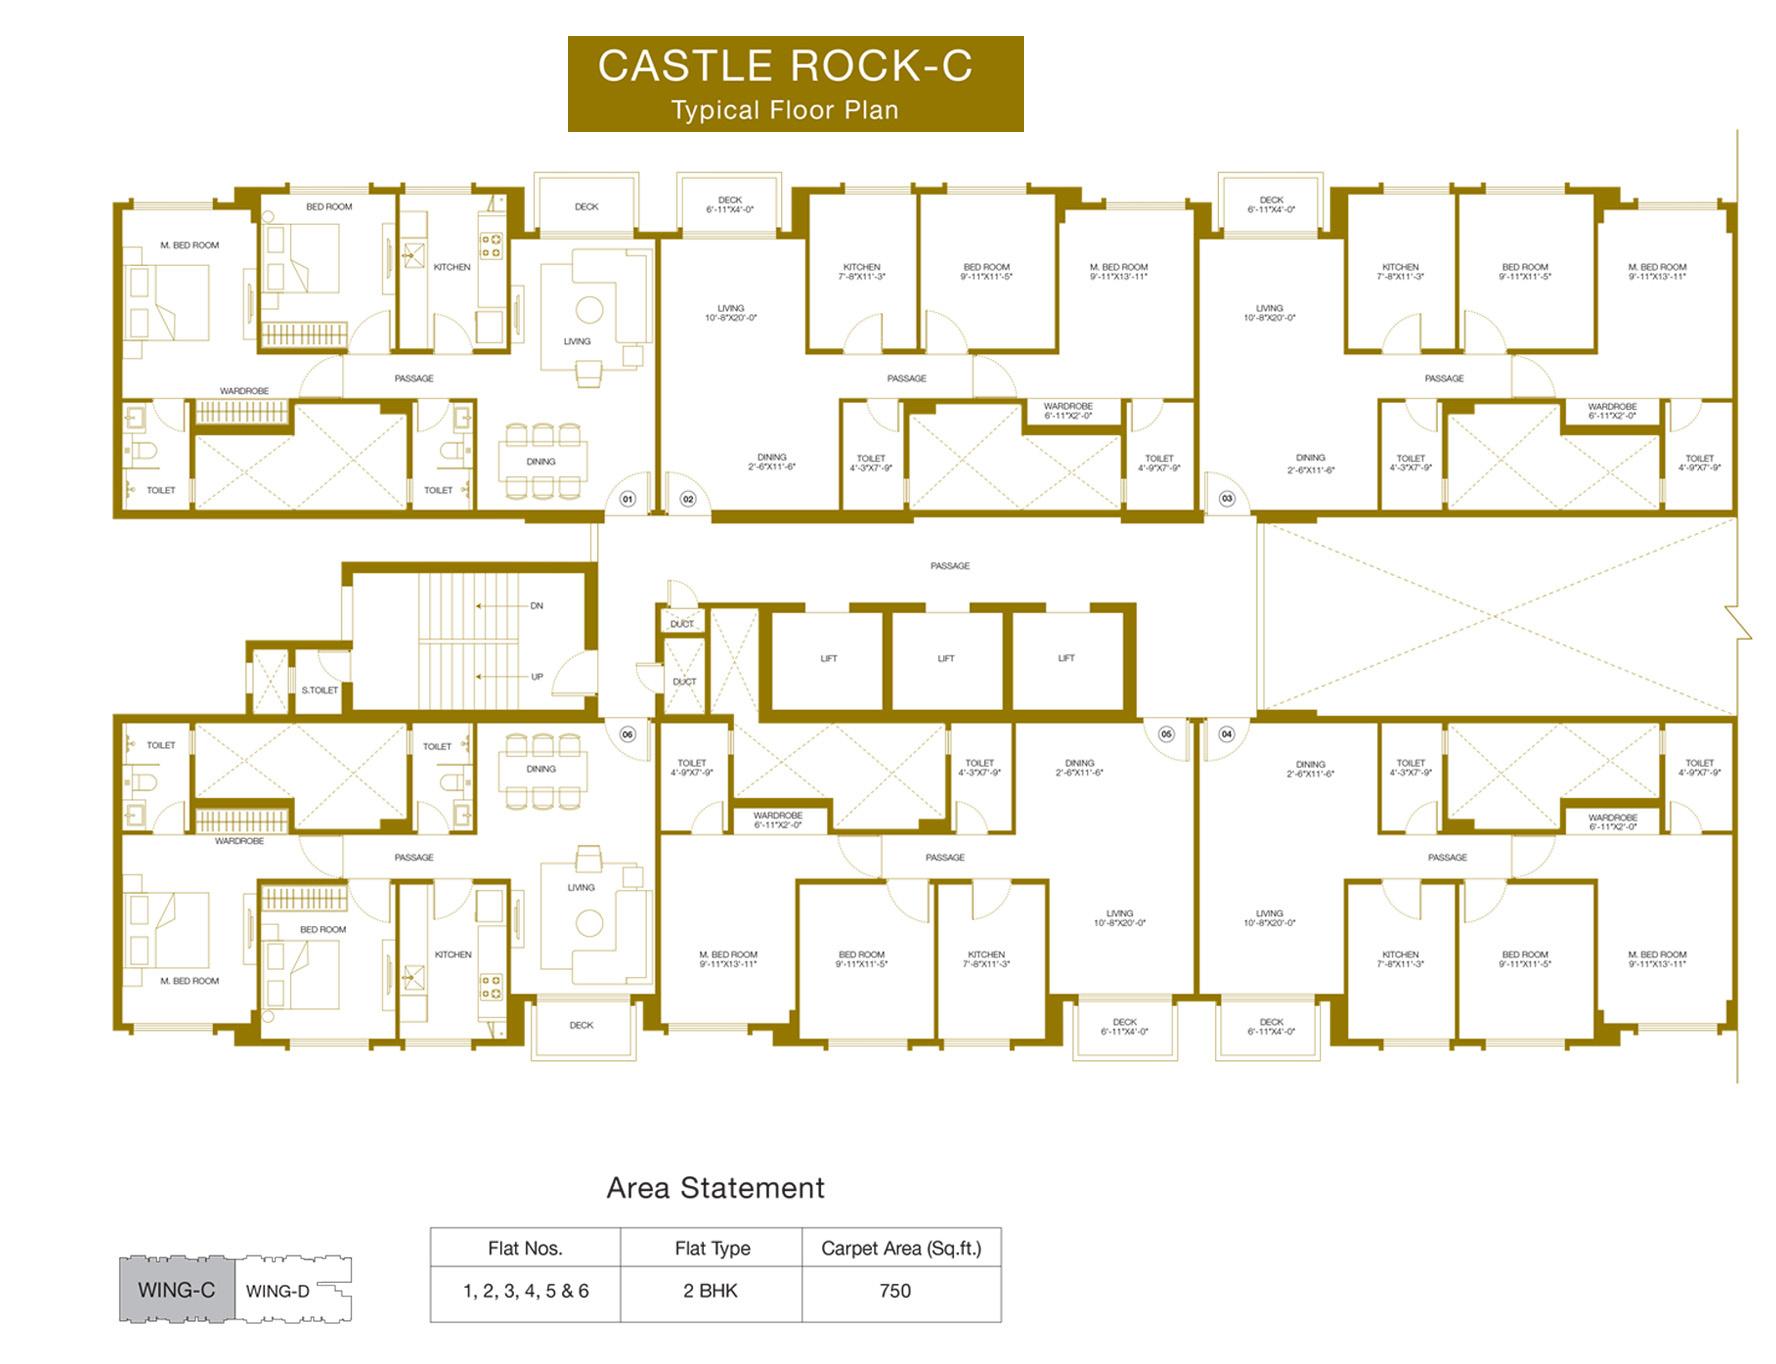 hiranandani castle rock in powai mumbai   price location